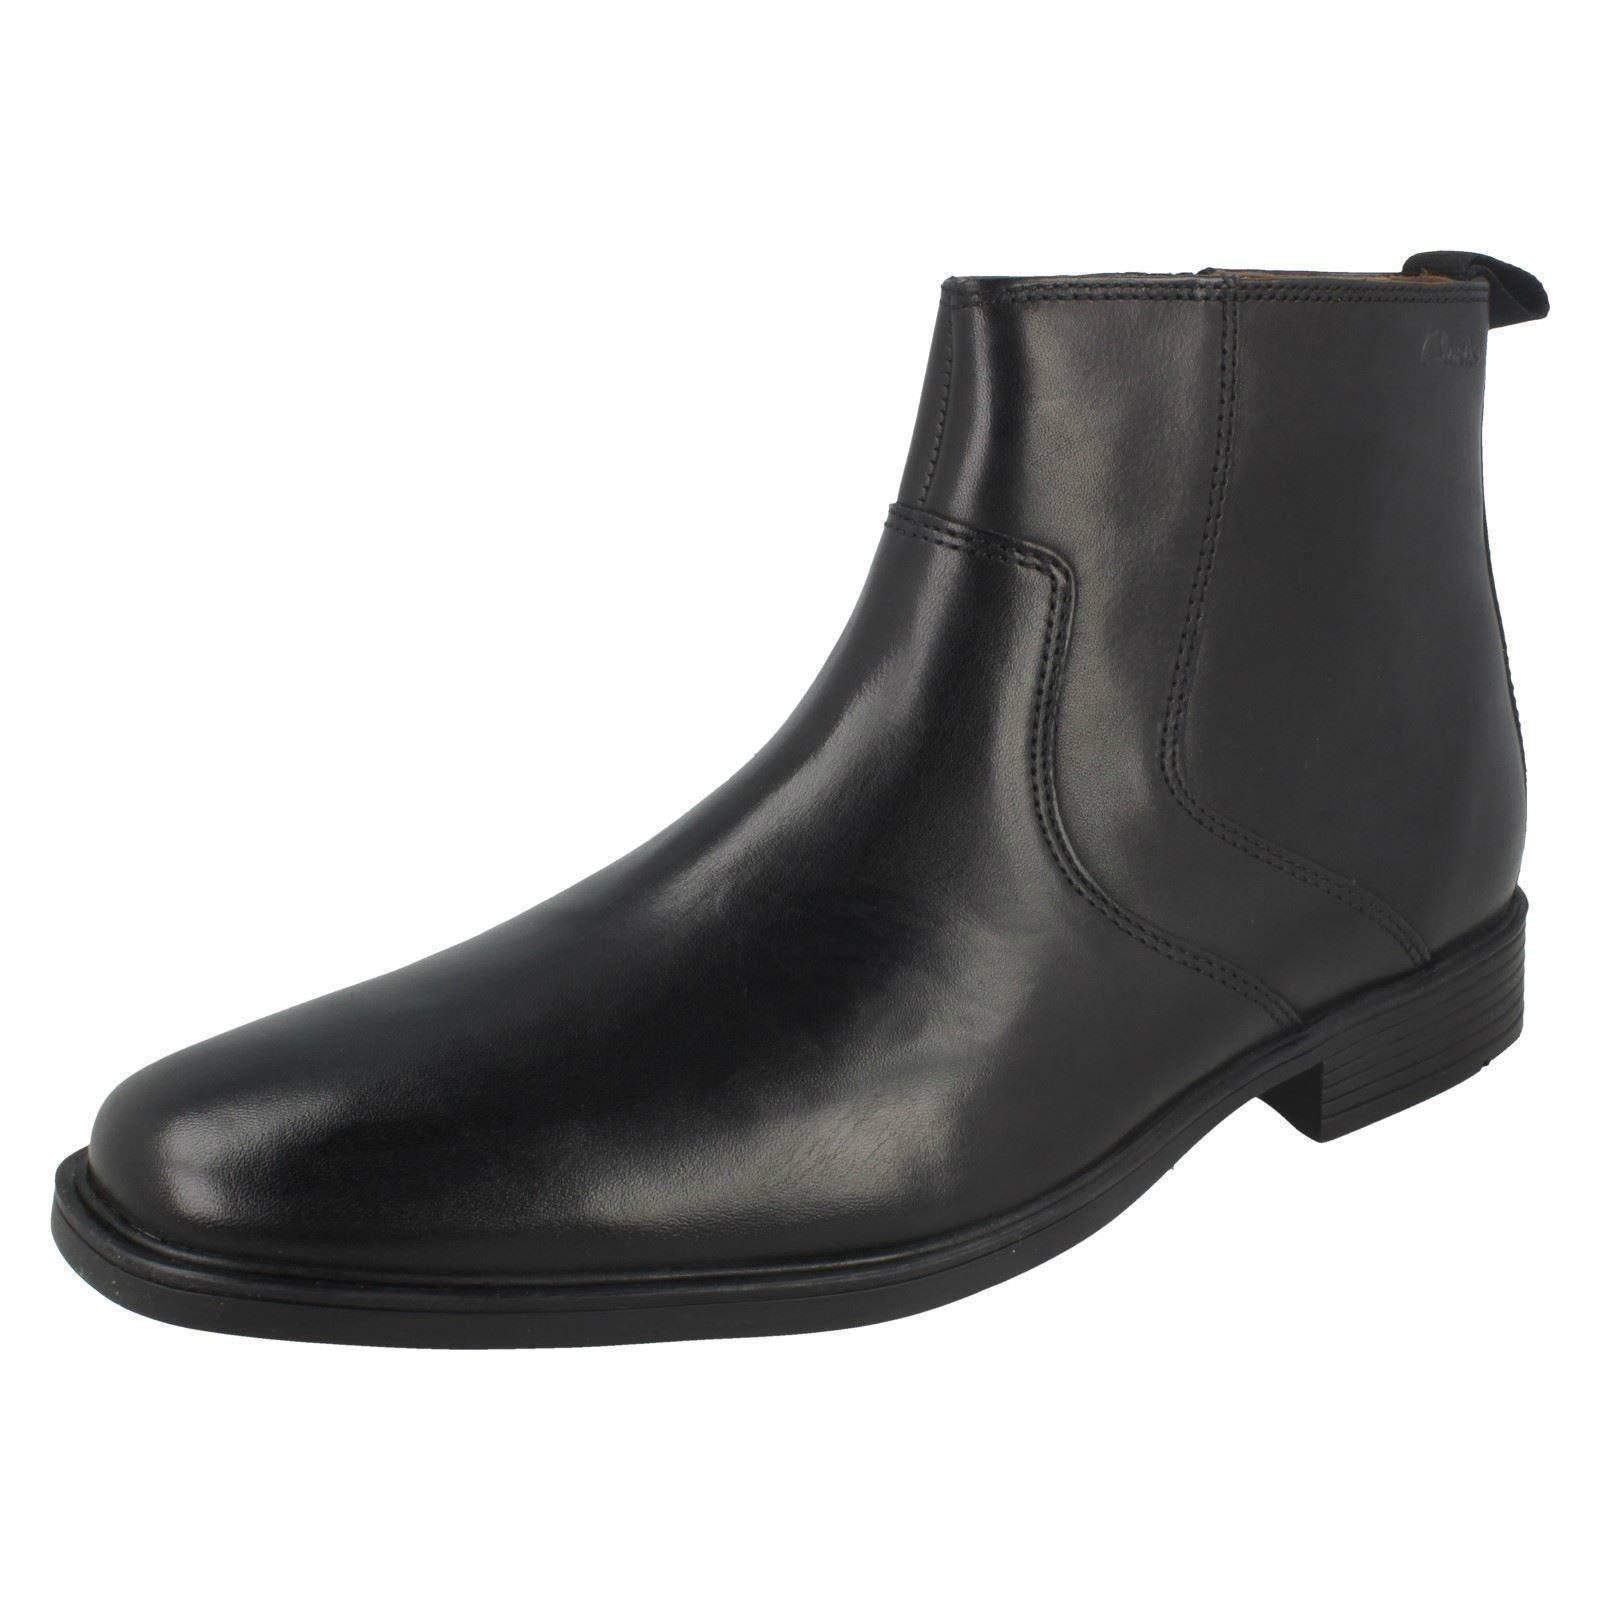 Clarks Tilden Cremallera Negro Ajuste G botas Hombre Cuero (Mr )